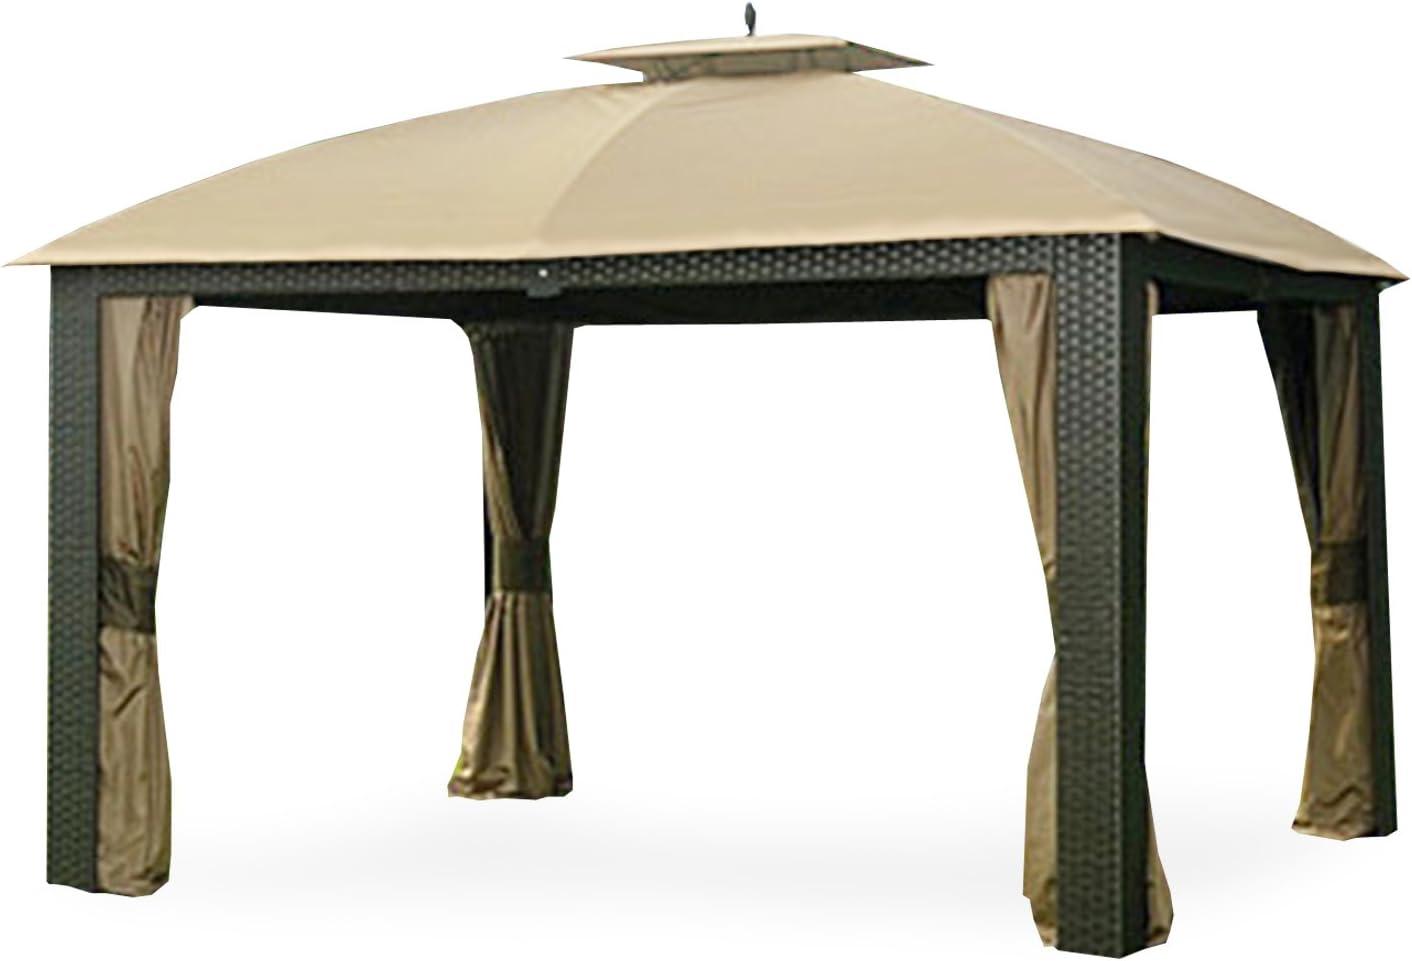 Garden Winds Replacement Canopy for The Sonoma Riviera Wicker Gazebo - Standard 350 - Beige